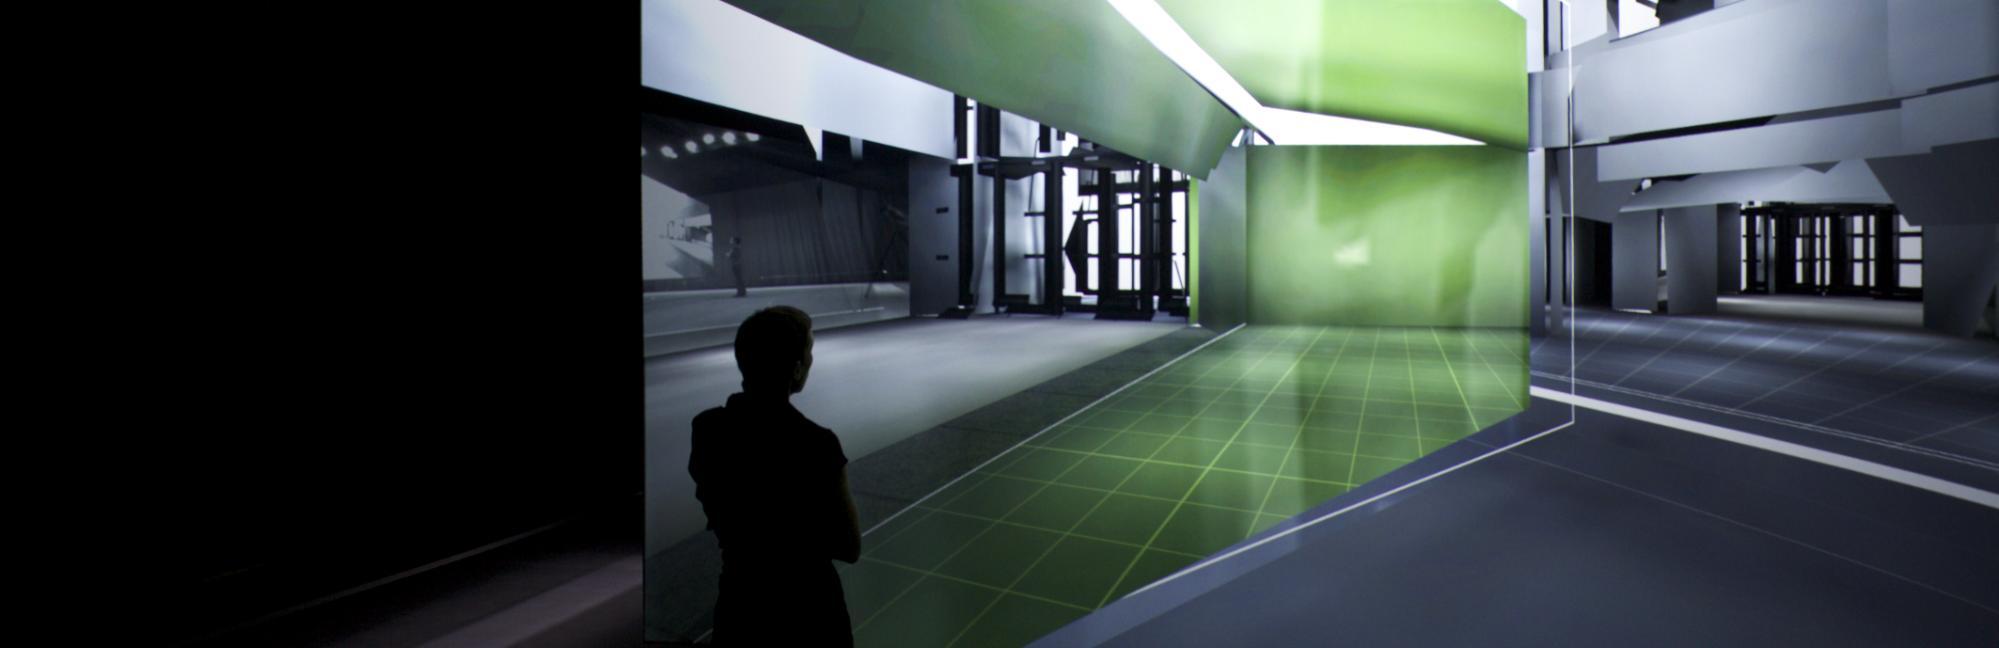 immersive design studios takes ue4 beyond gaming gamzdevz